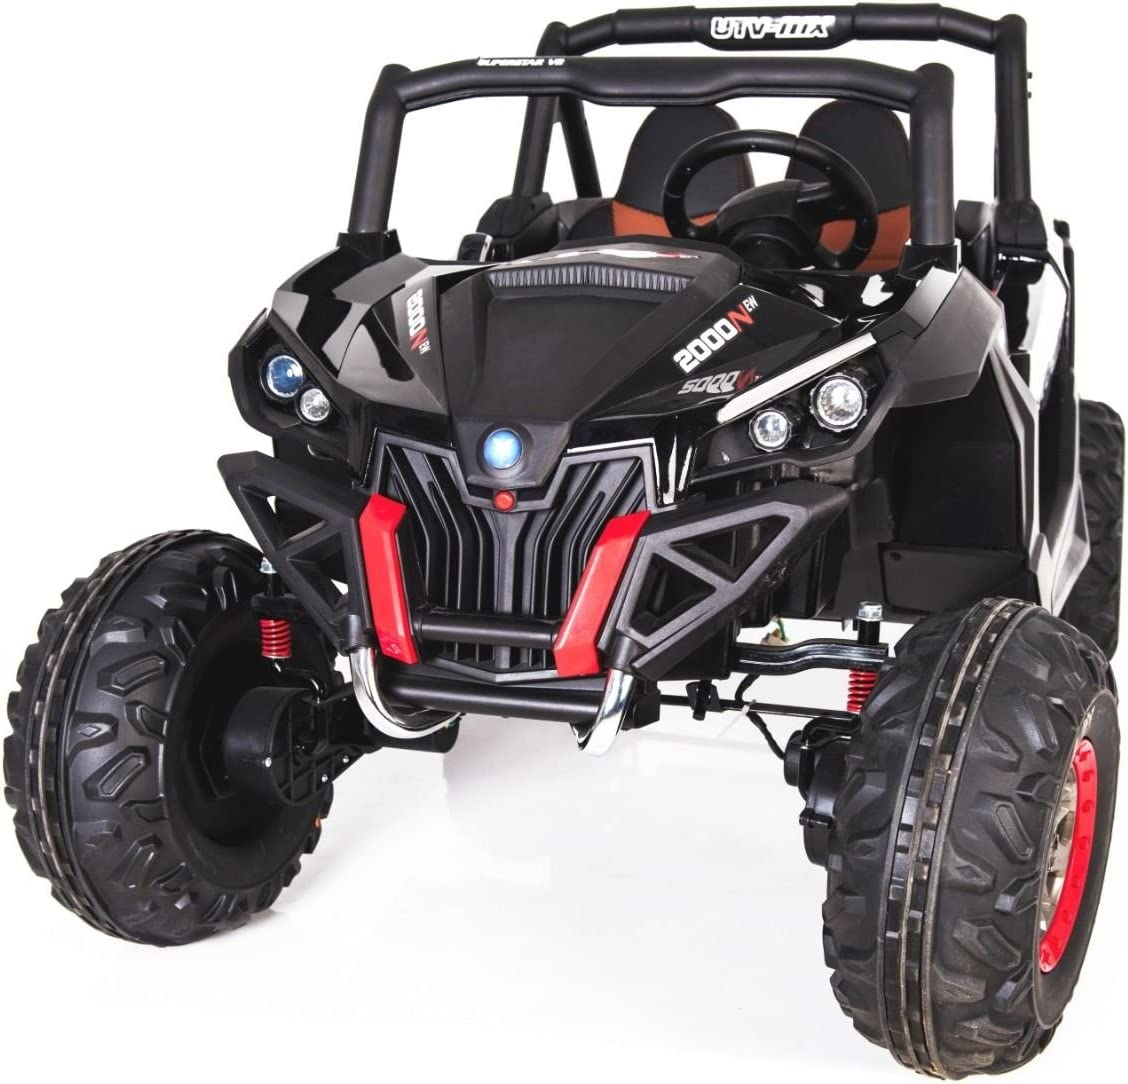 CARS12V Coche ELÉCTRICO para NIÑOS RSX Buggy 24V 2 PLAZAS RC (Negro)